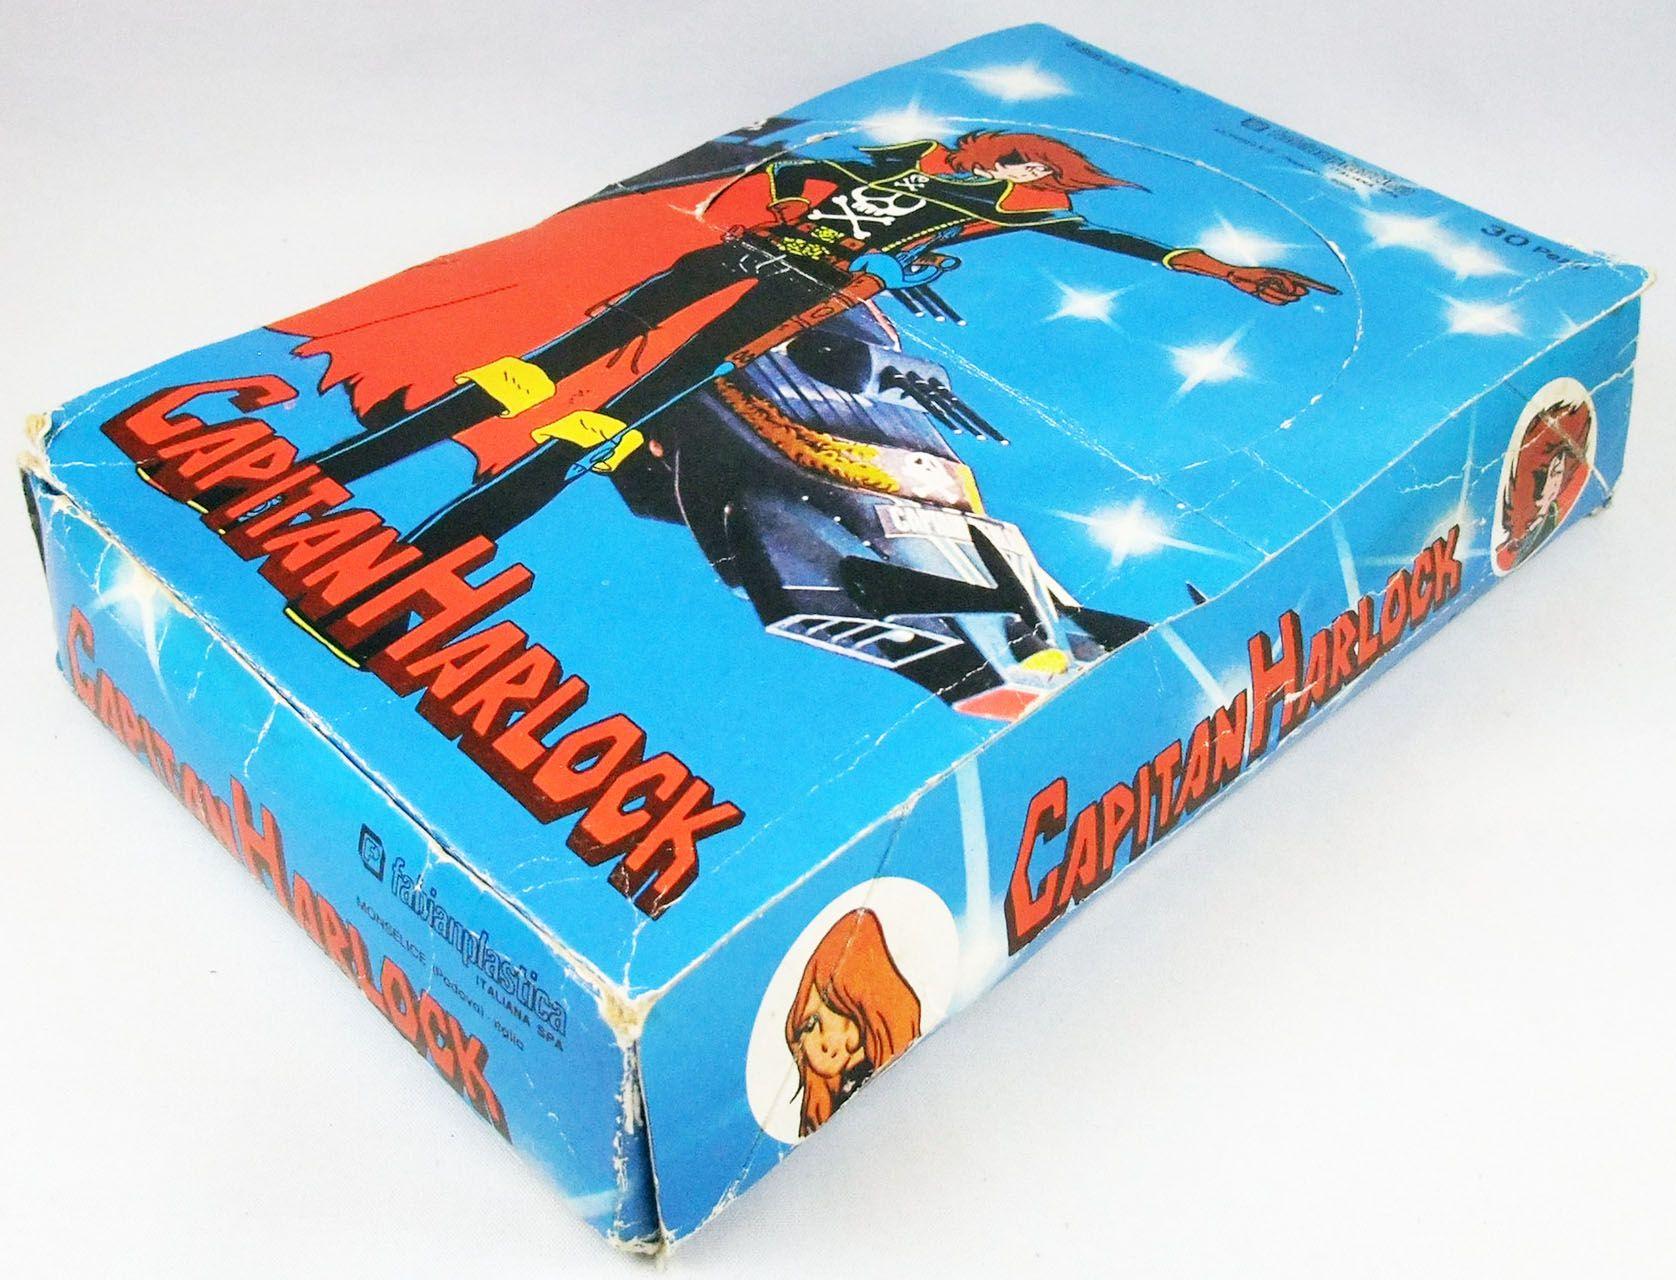 Albator - Boite présentoir pour figurines pvc - Fabianplastica